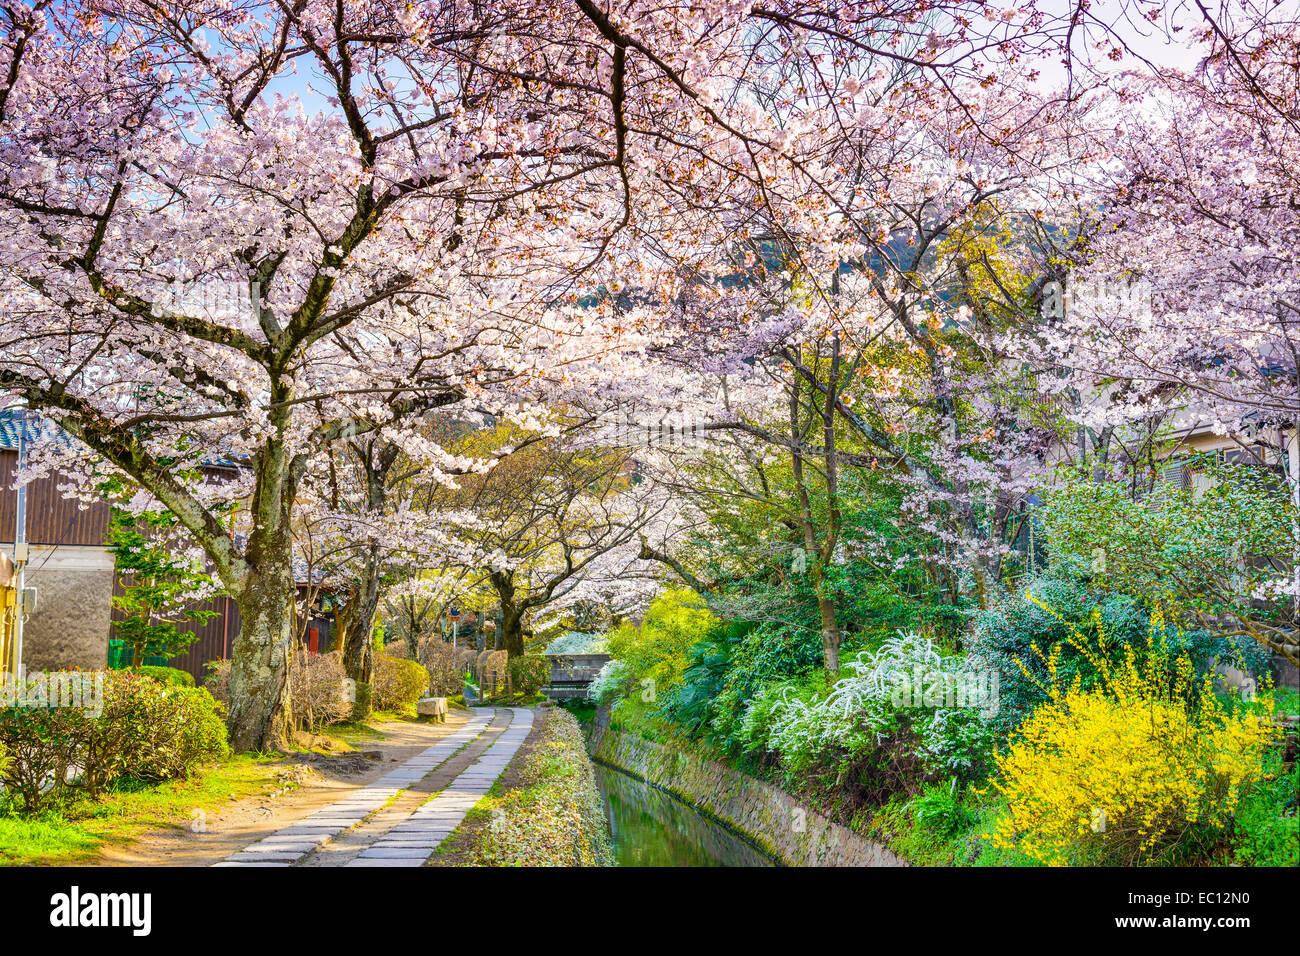 Kyoto, Japan des Philosophen wie im Frühling. Stockbild